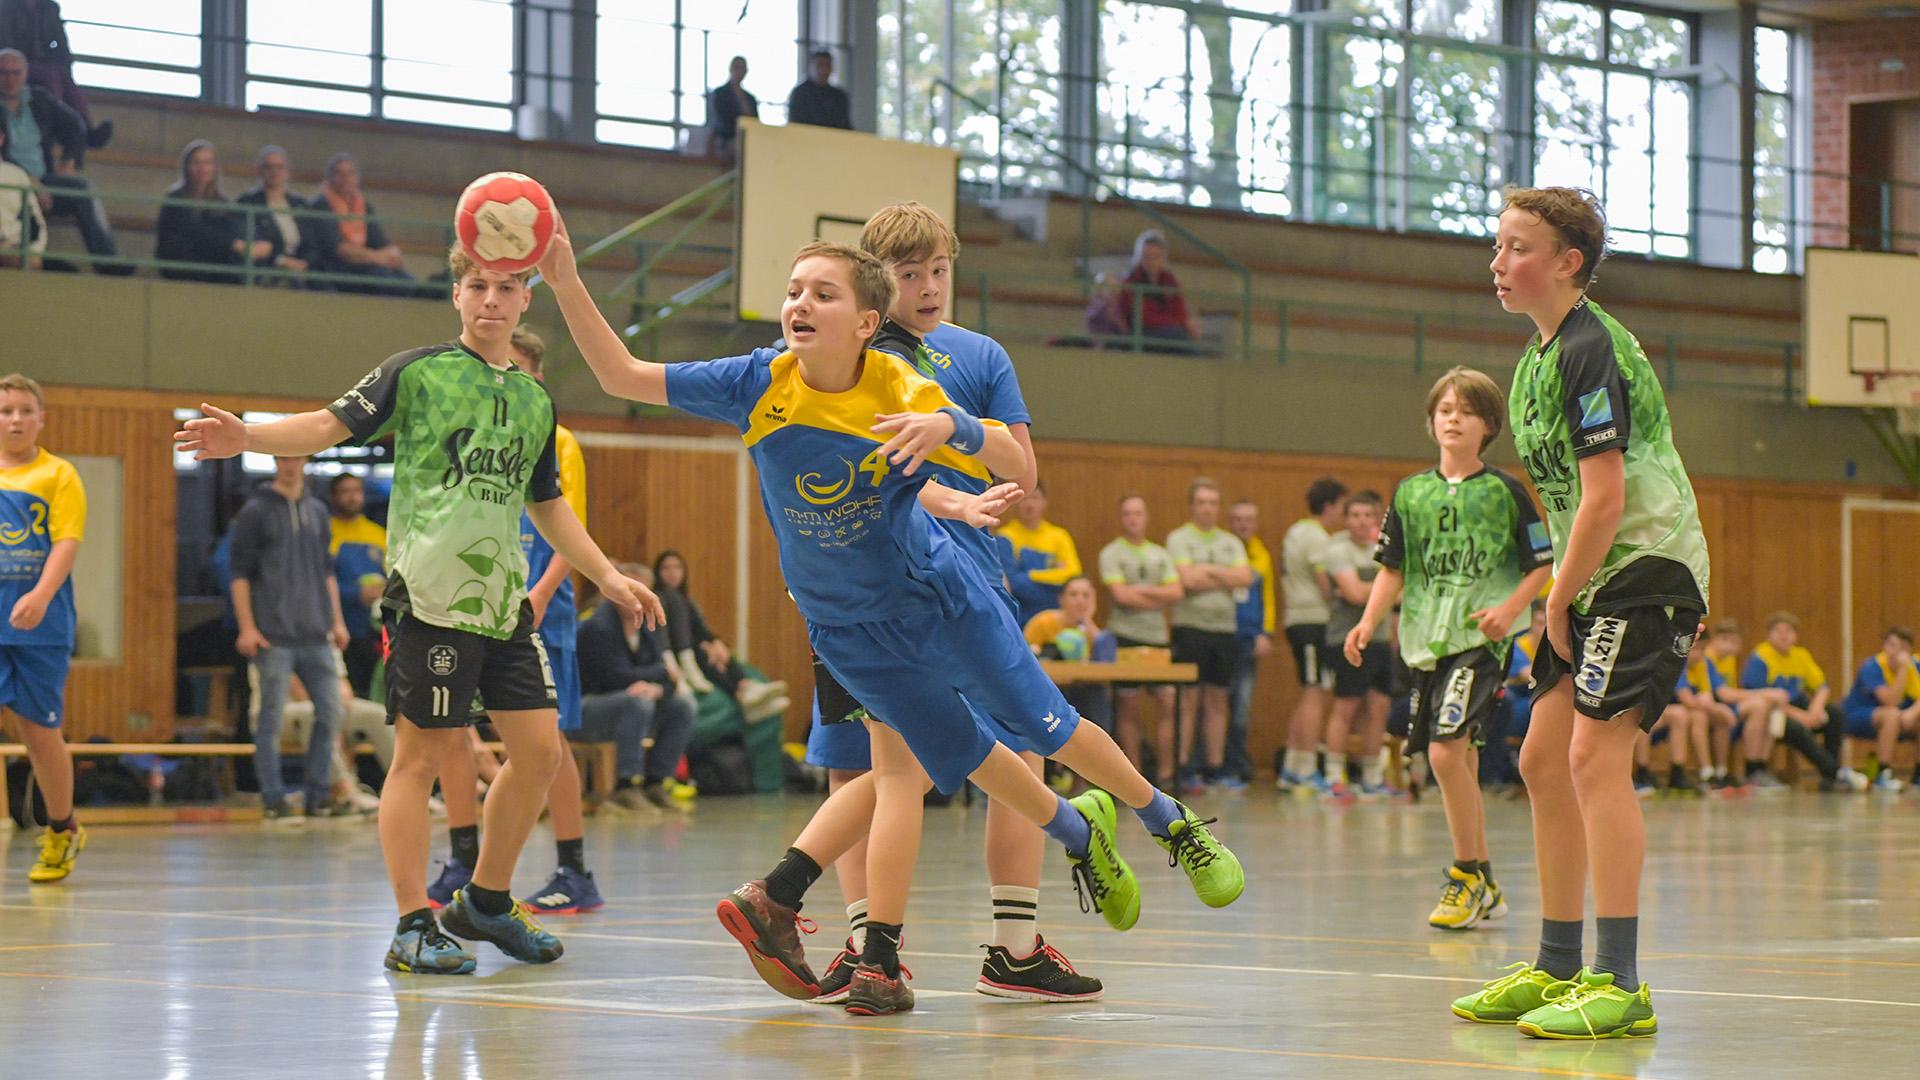 095Slider_mC_tsg_leutkirch_handball